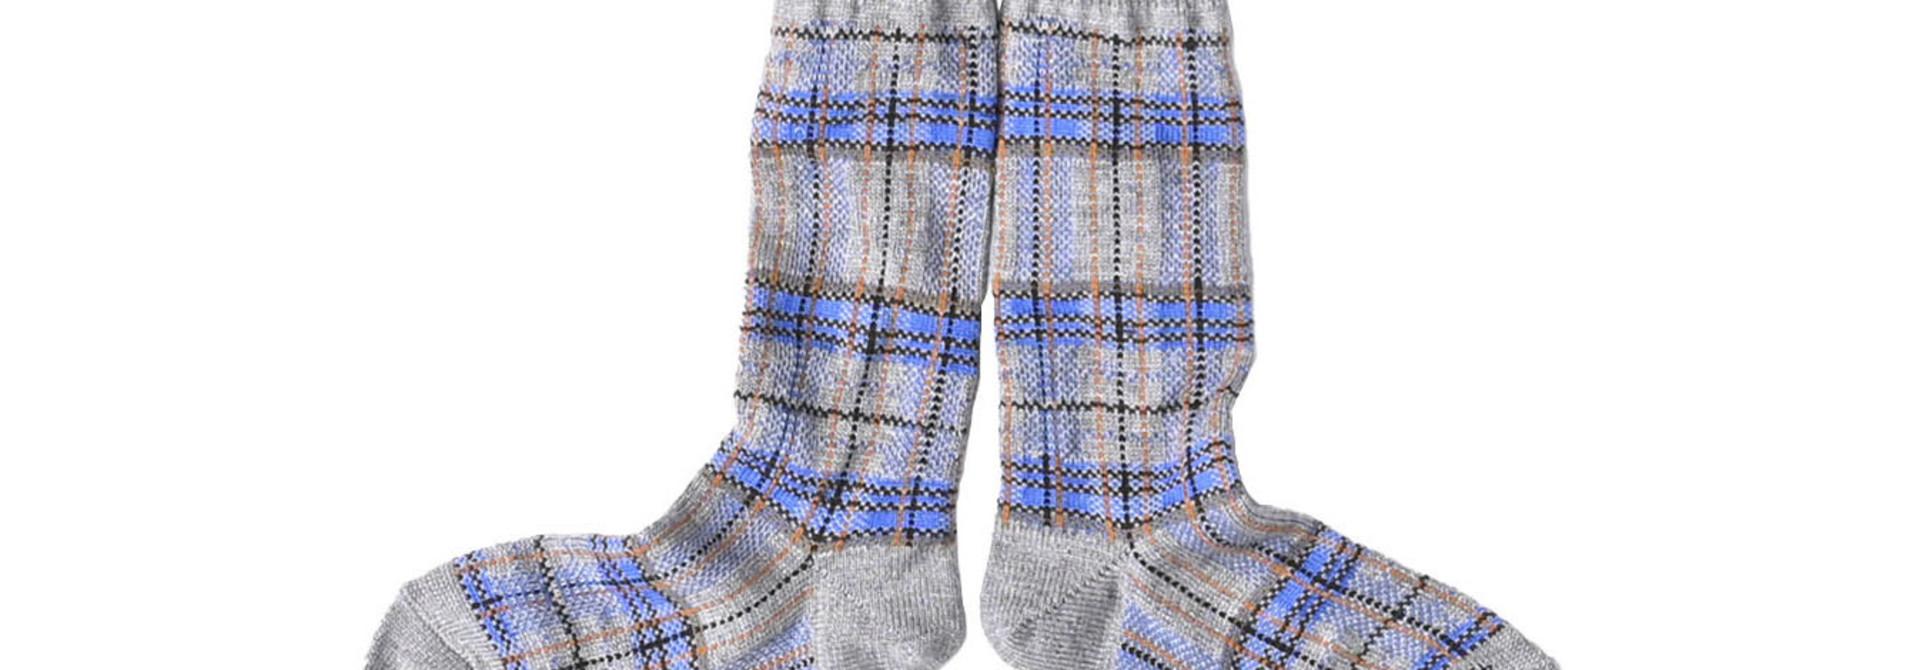 Plaid Knit Socks